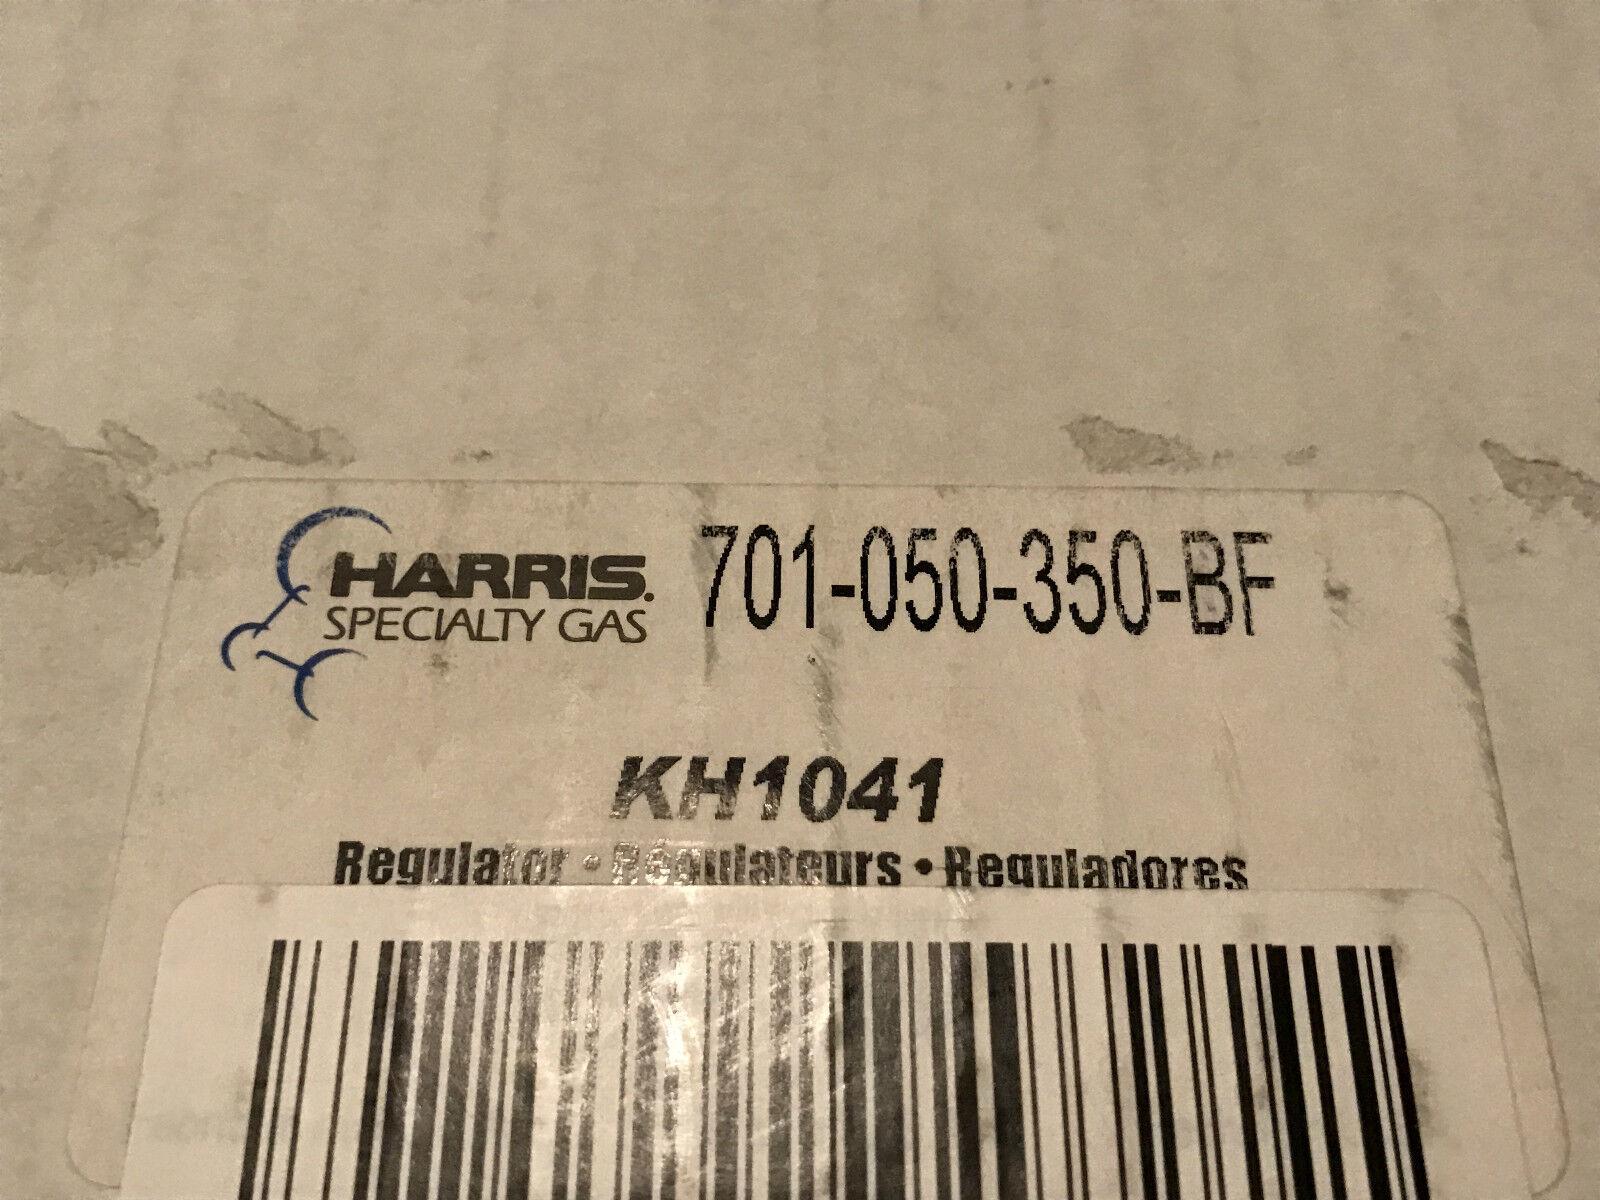 50 psi CO2 Harris KH1053 Model 702 2 Stage Regulator